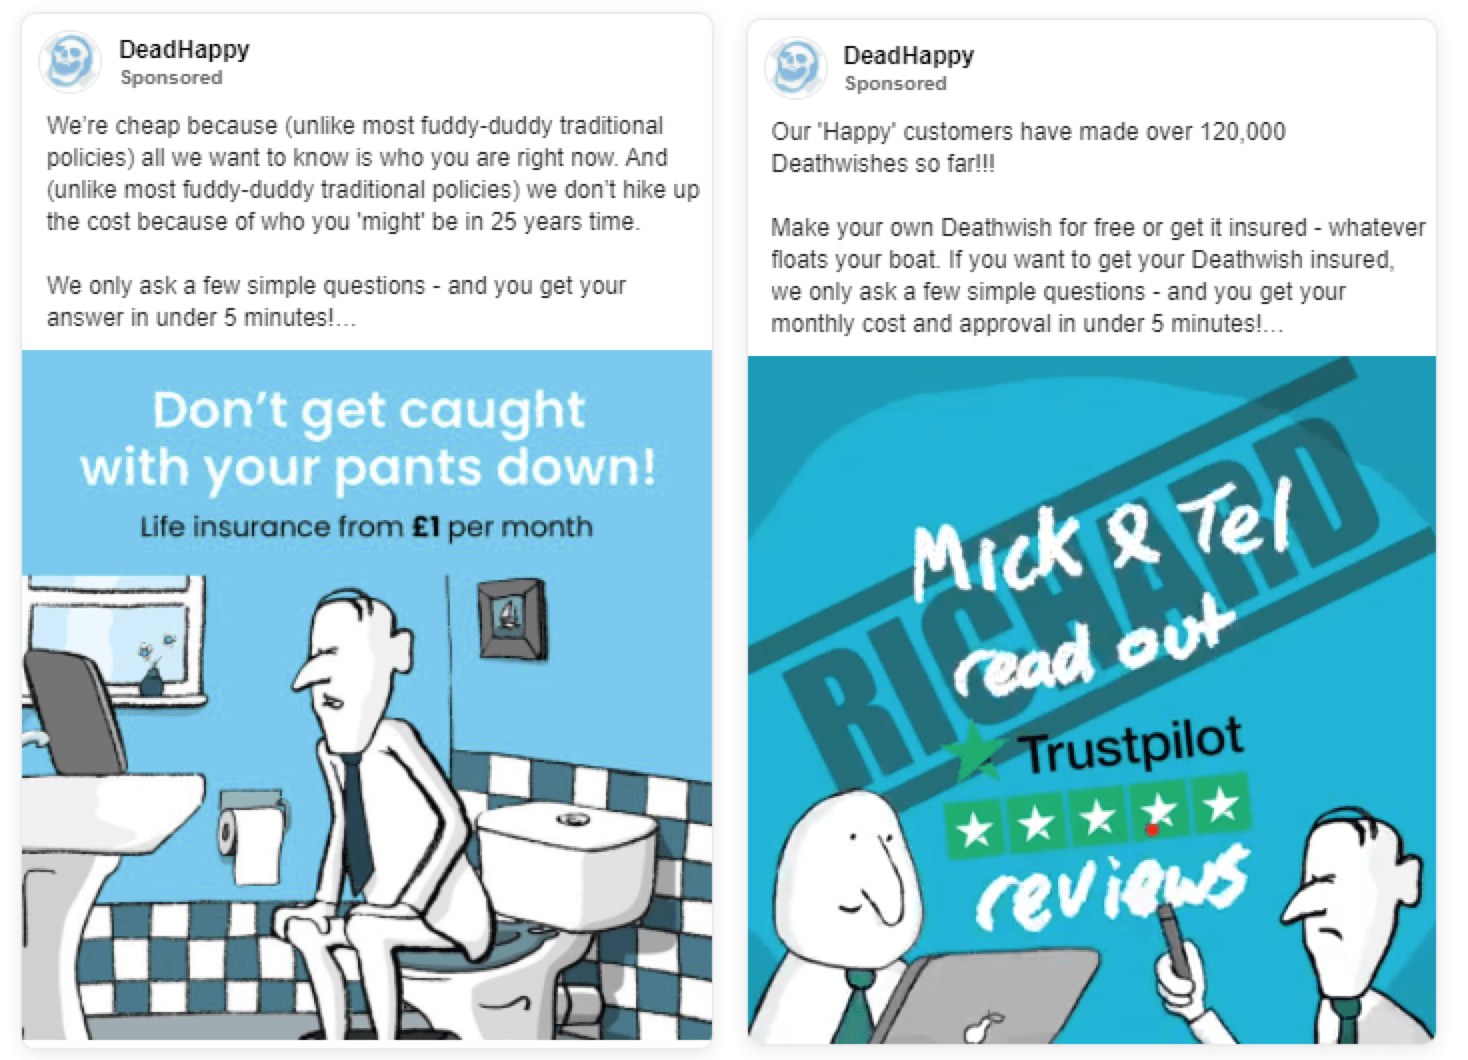 DeadHappy Facebook ads